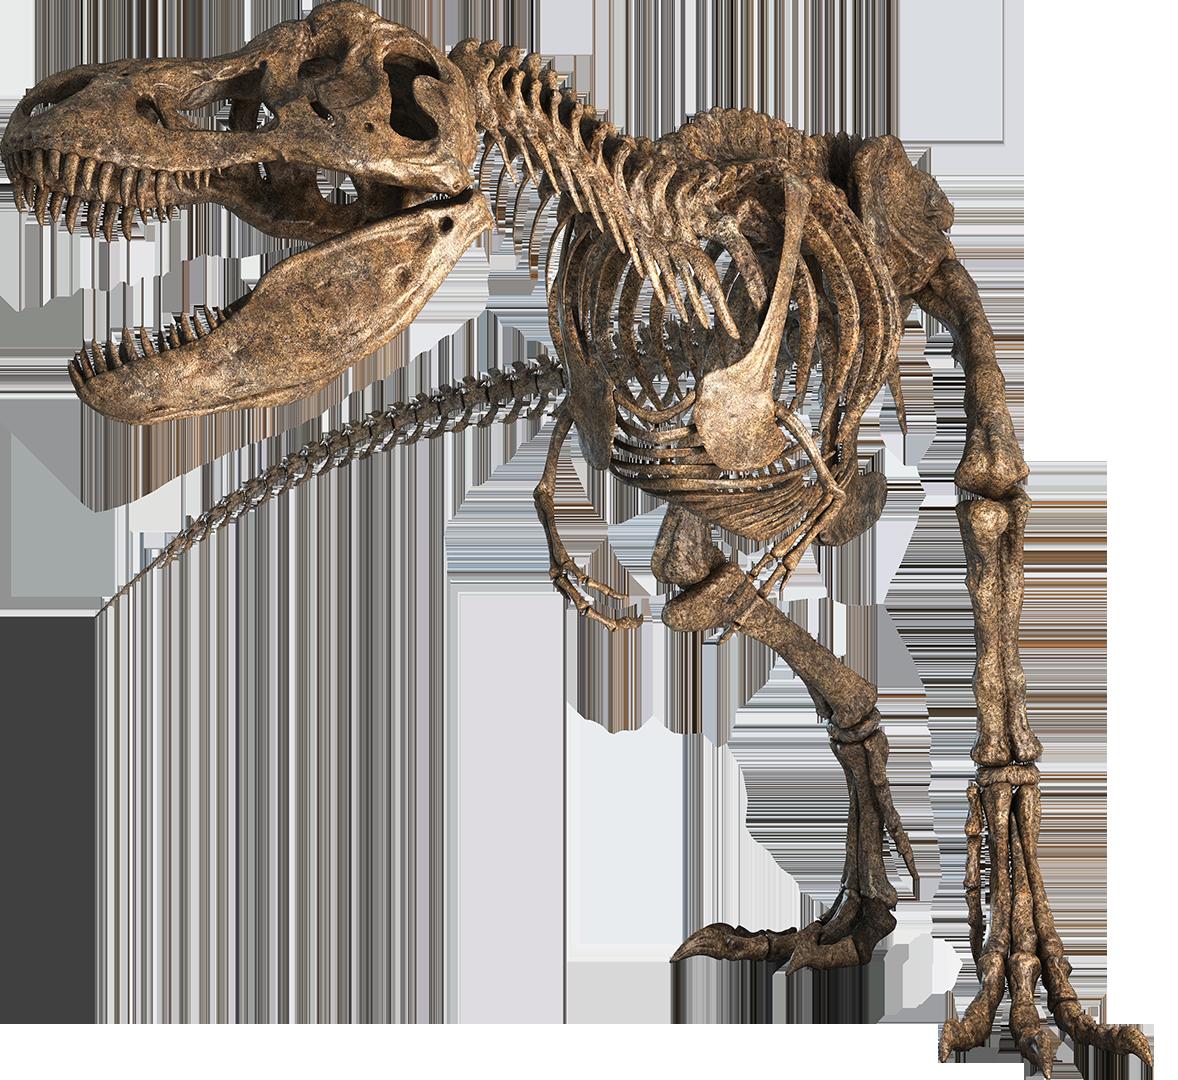 Tyrannosauruscleaner Png 1178 1080 Fossils Dinosaur Fossils Dinosaur Skeleton